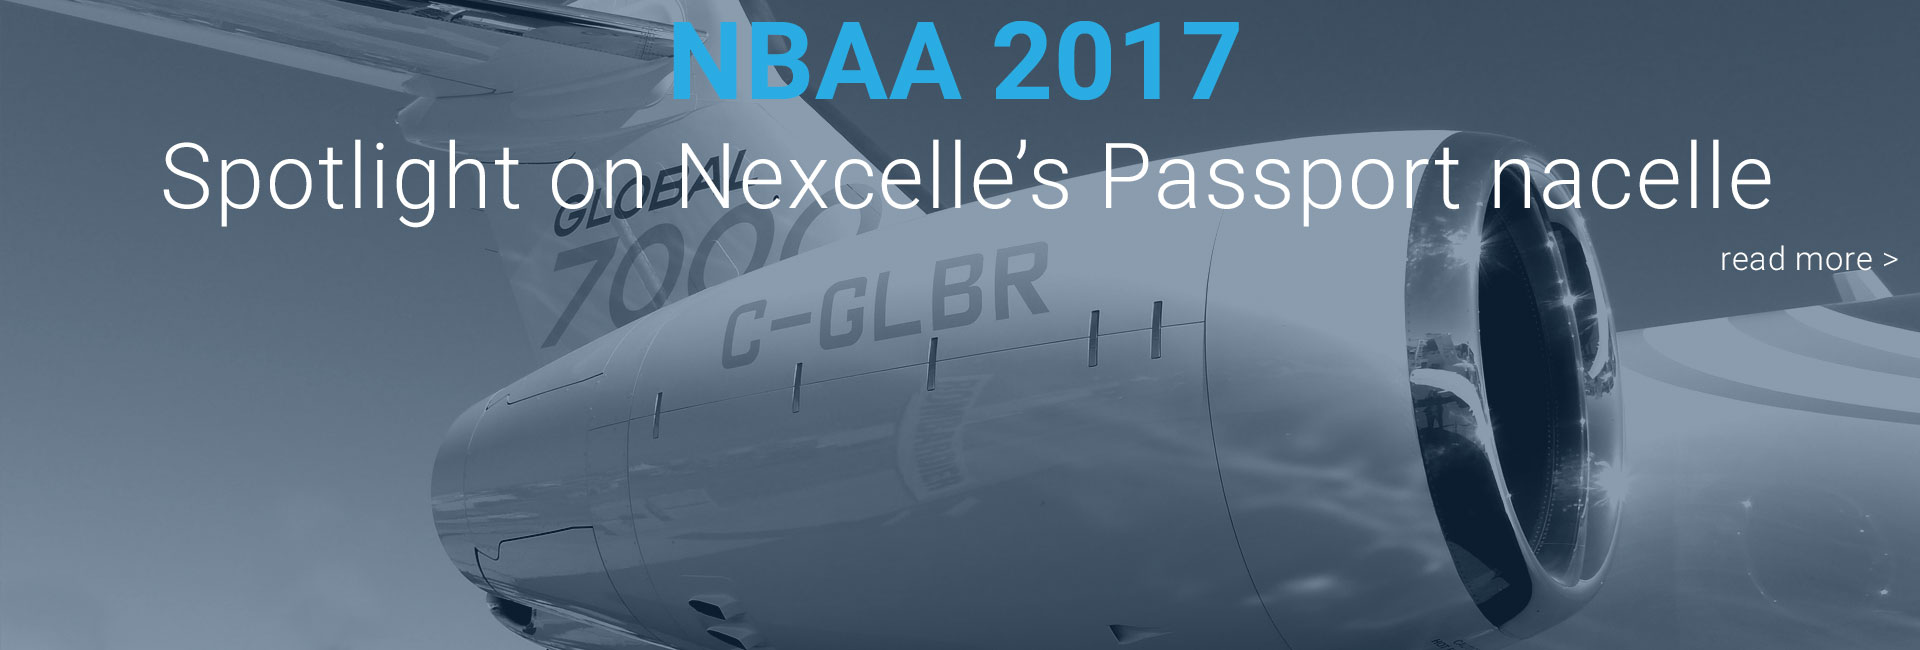 Bombardier Global 7000 at NBAA 2017